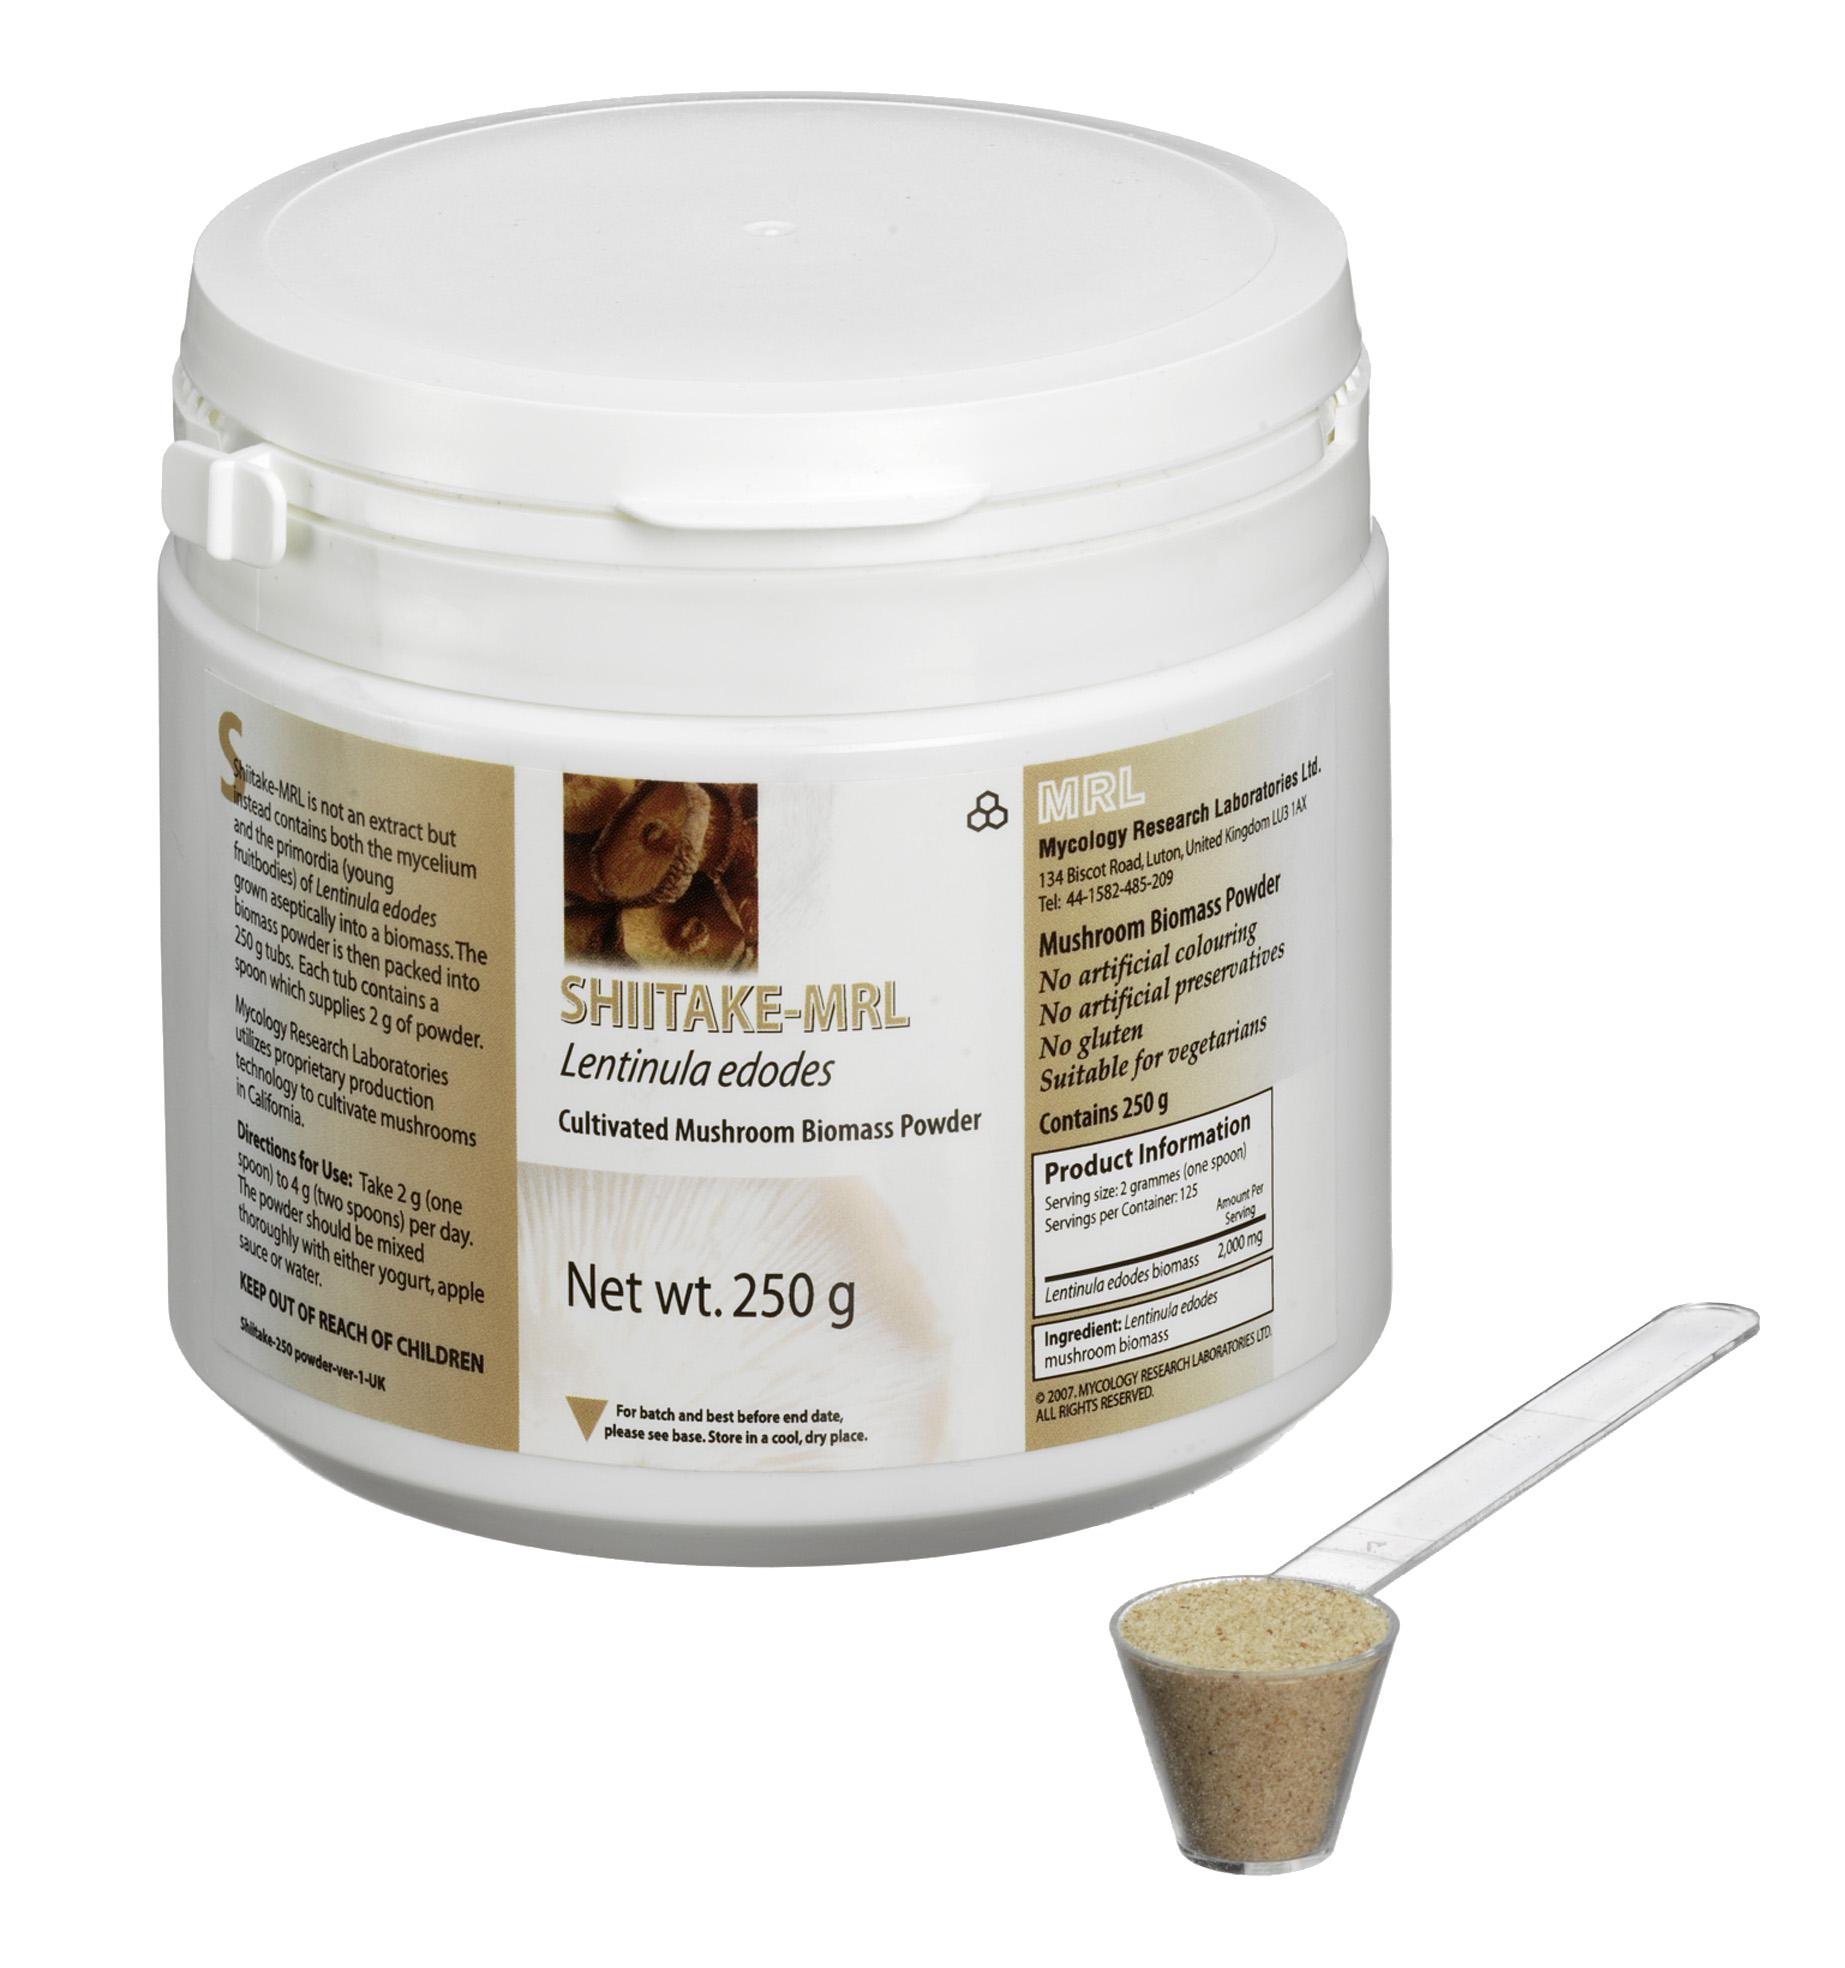 Shiitake-MRL 250g powder